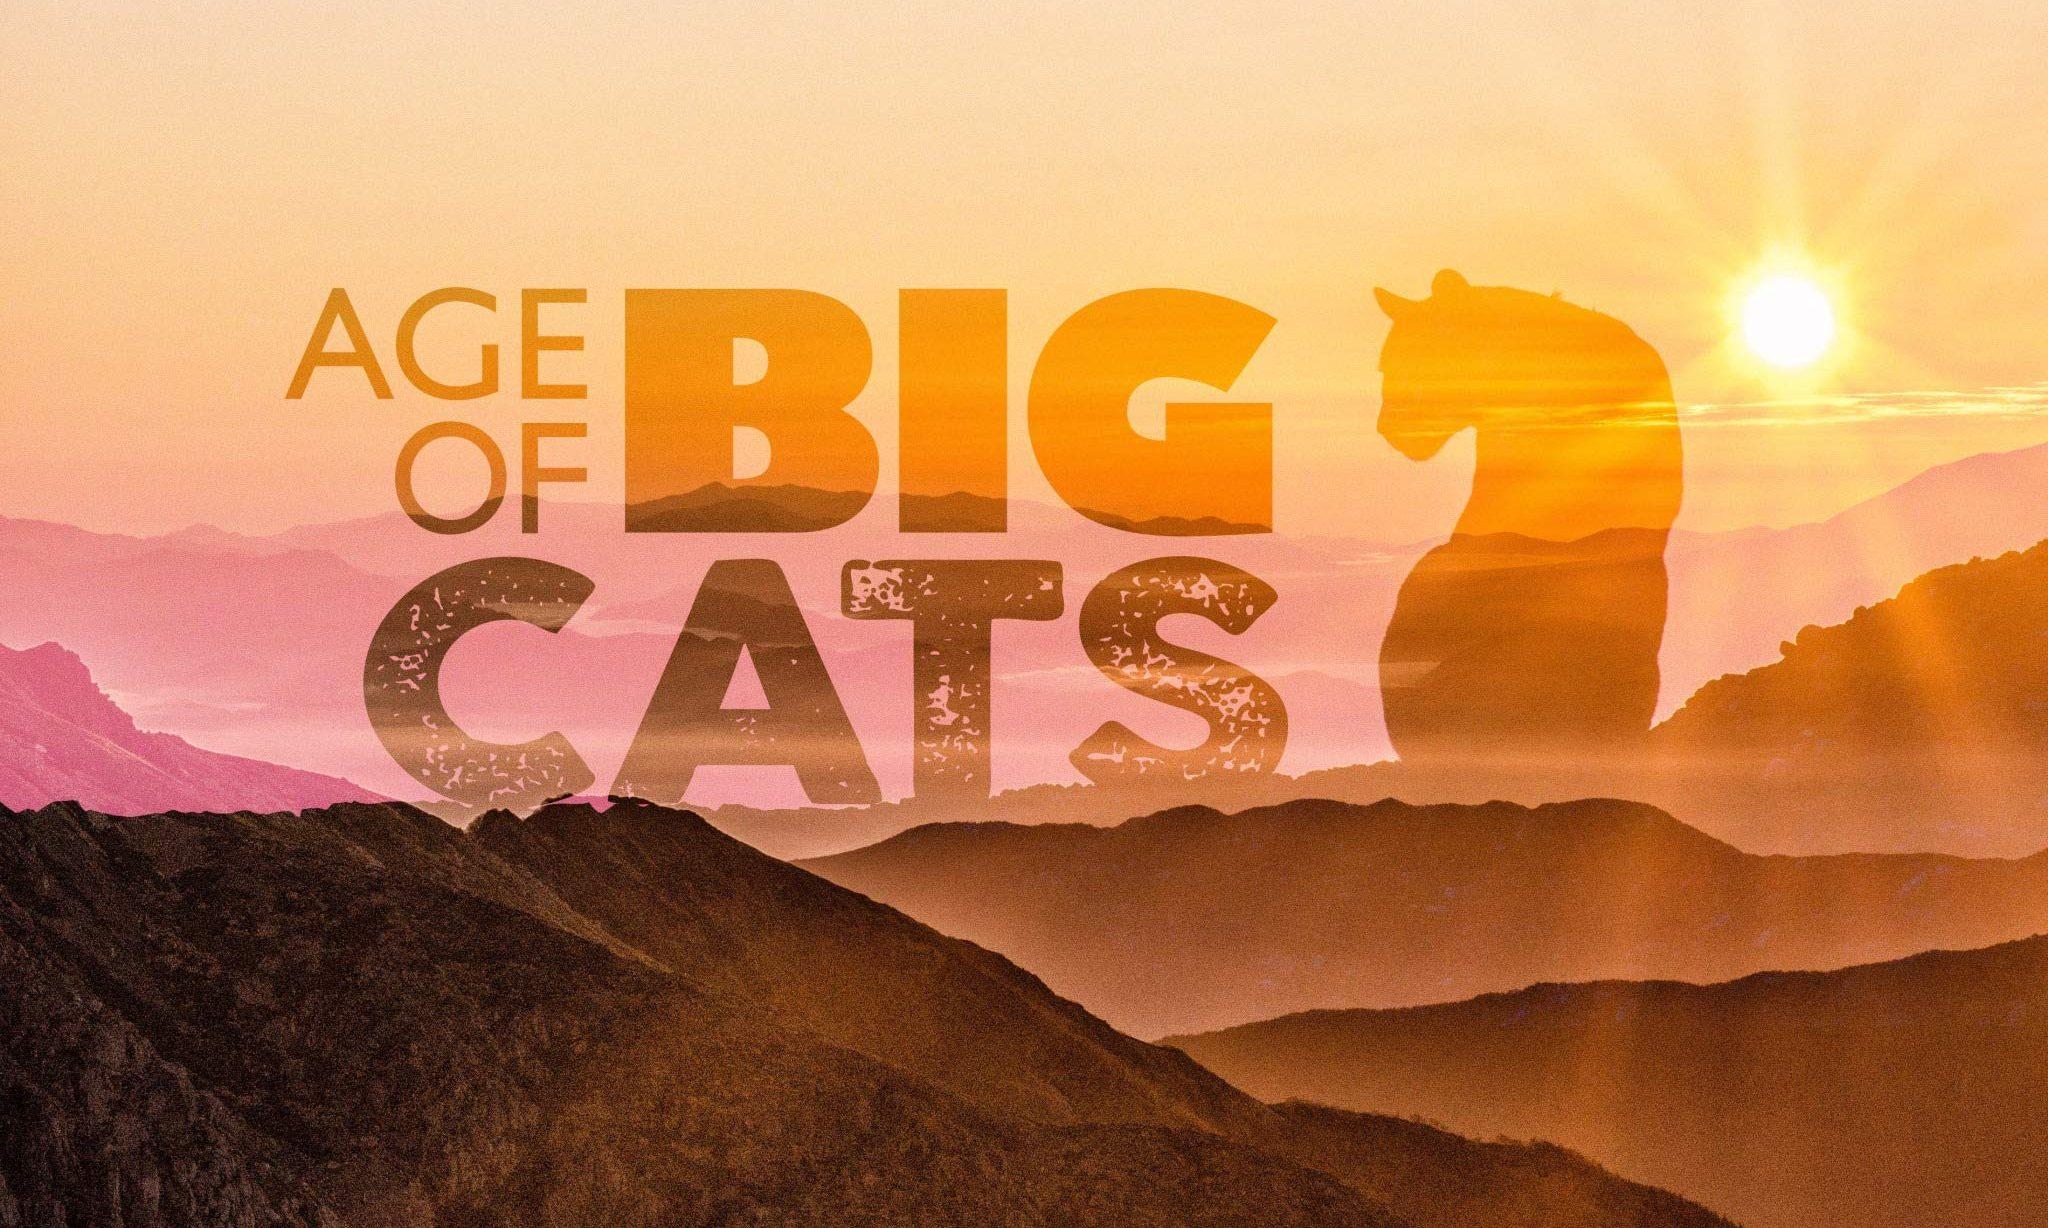 Evolution of Wild Cats Video